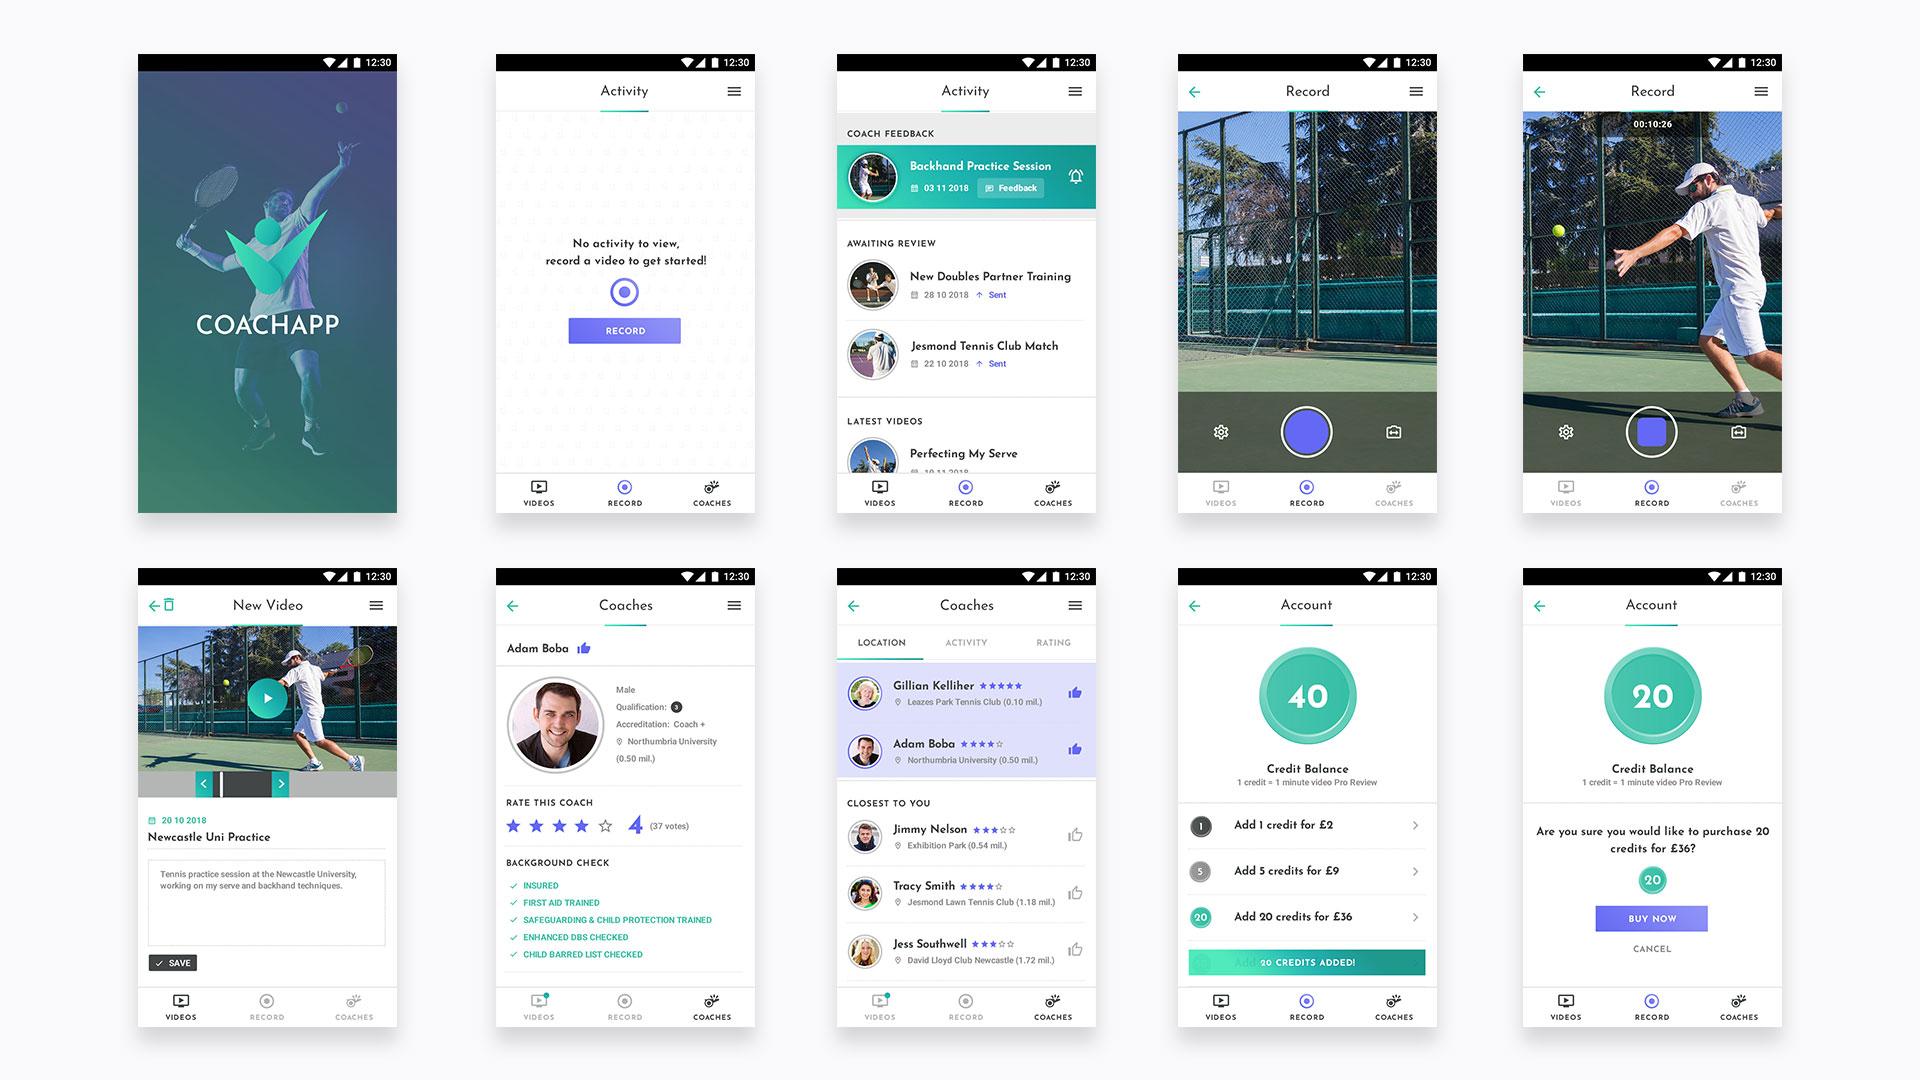 App Design & Development | Digital Services - Kino Creative